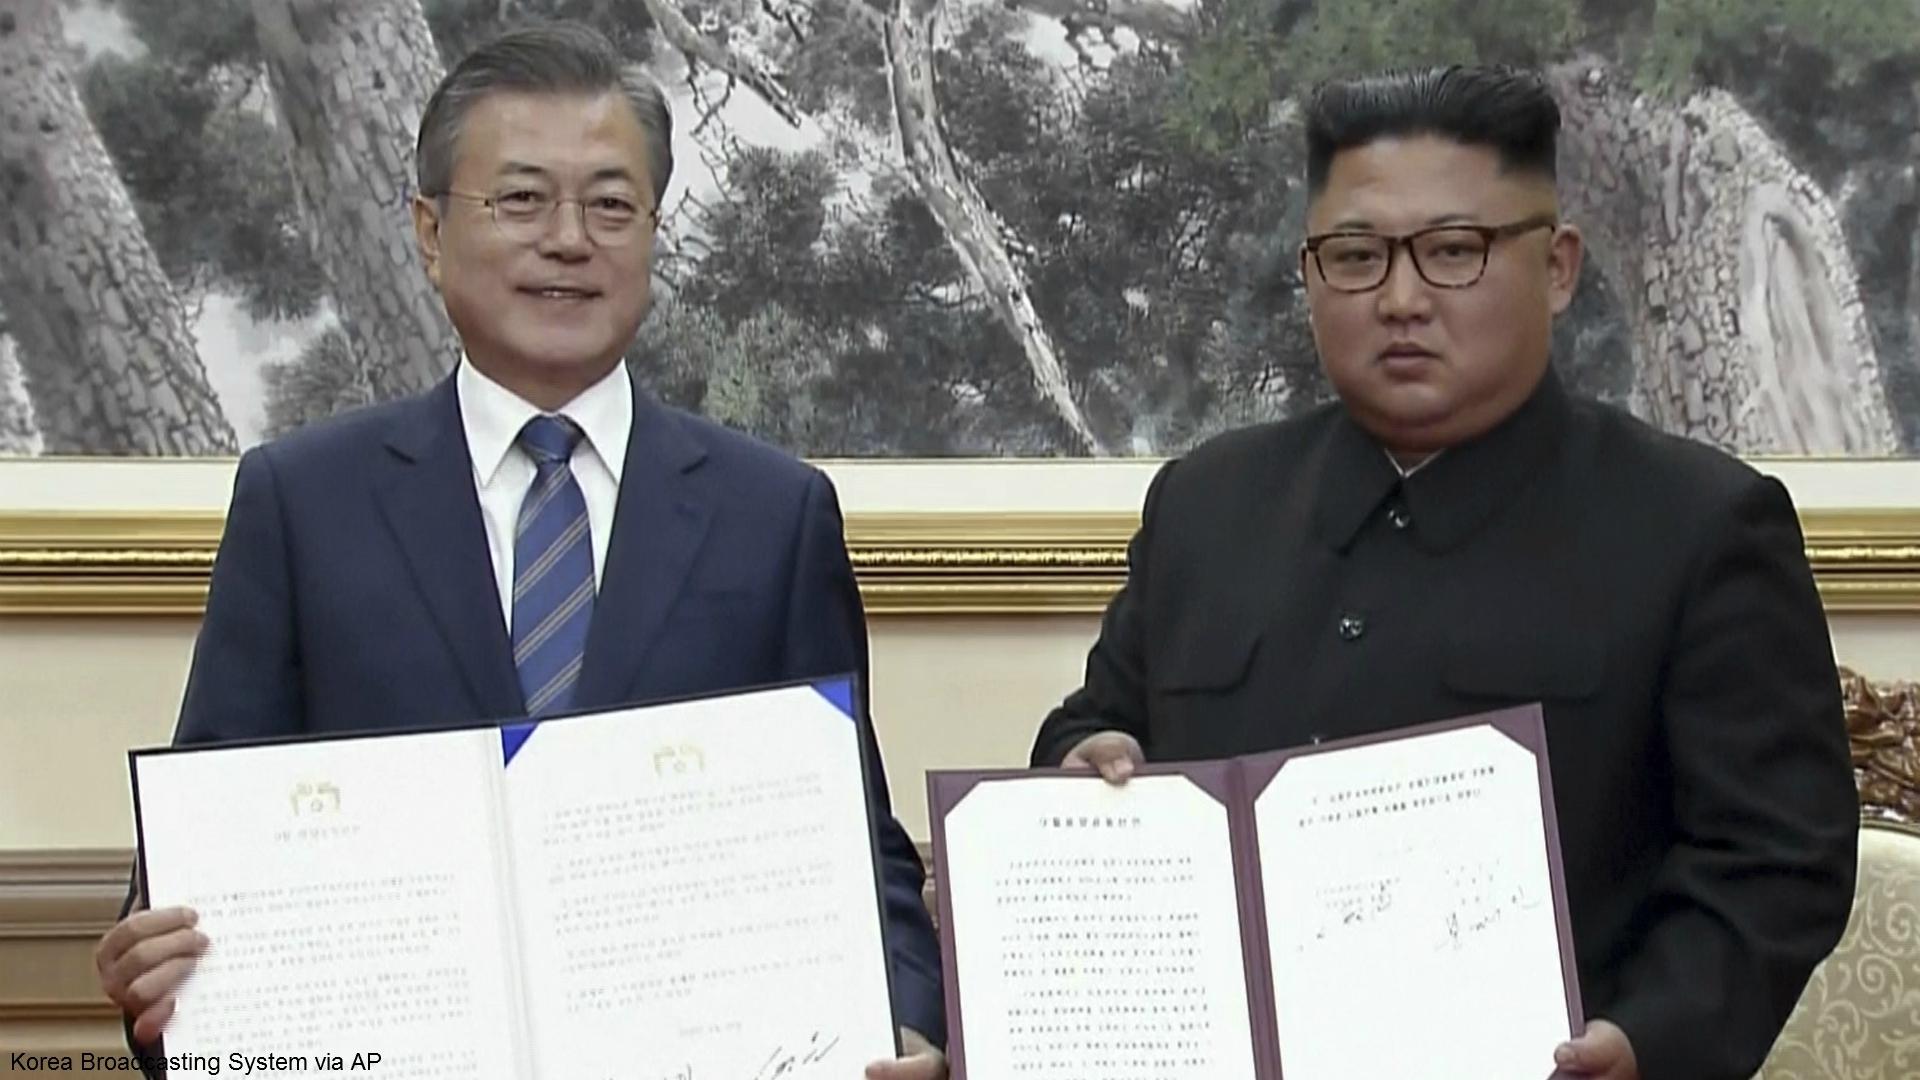 koreas joint agreement 091818 AP_1537325183907.jpg.jpg